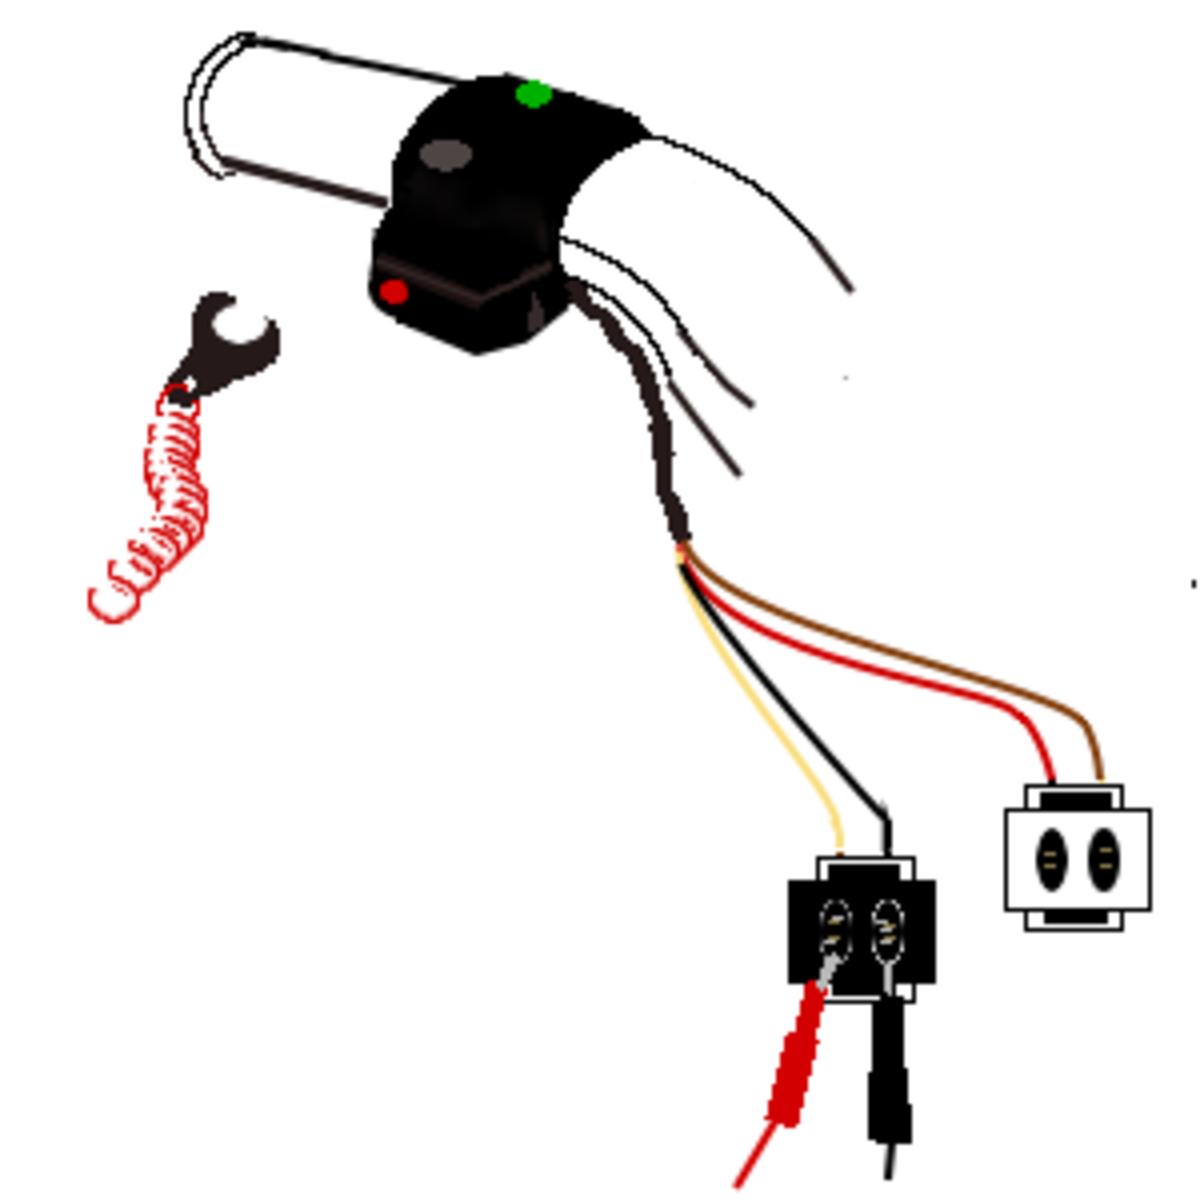 6. Insert the lanyard key. Probe the stop switch.